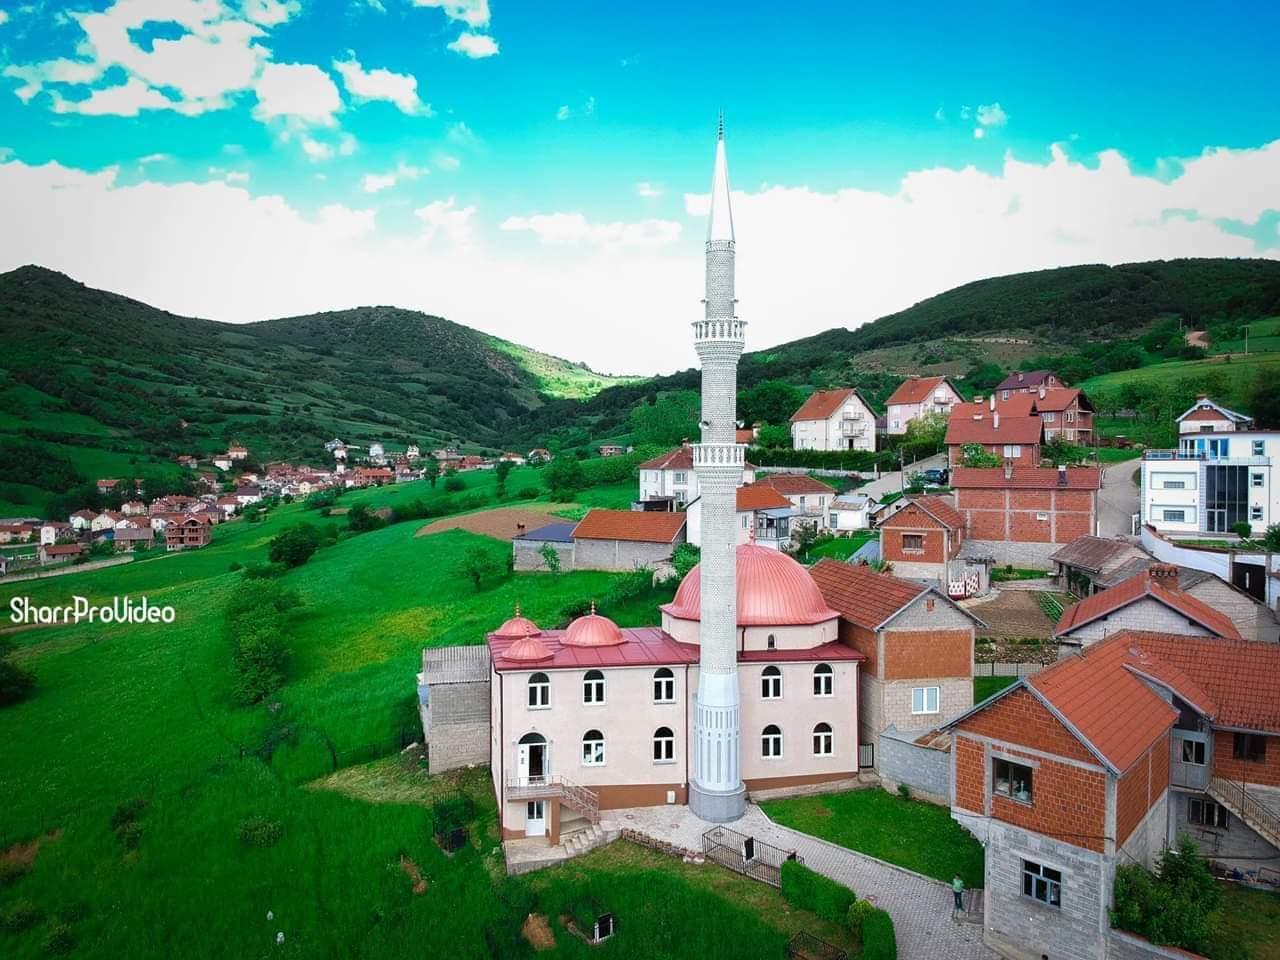 Fshati Zaplluxhe vendbanimi më i skajshëm i Opojës